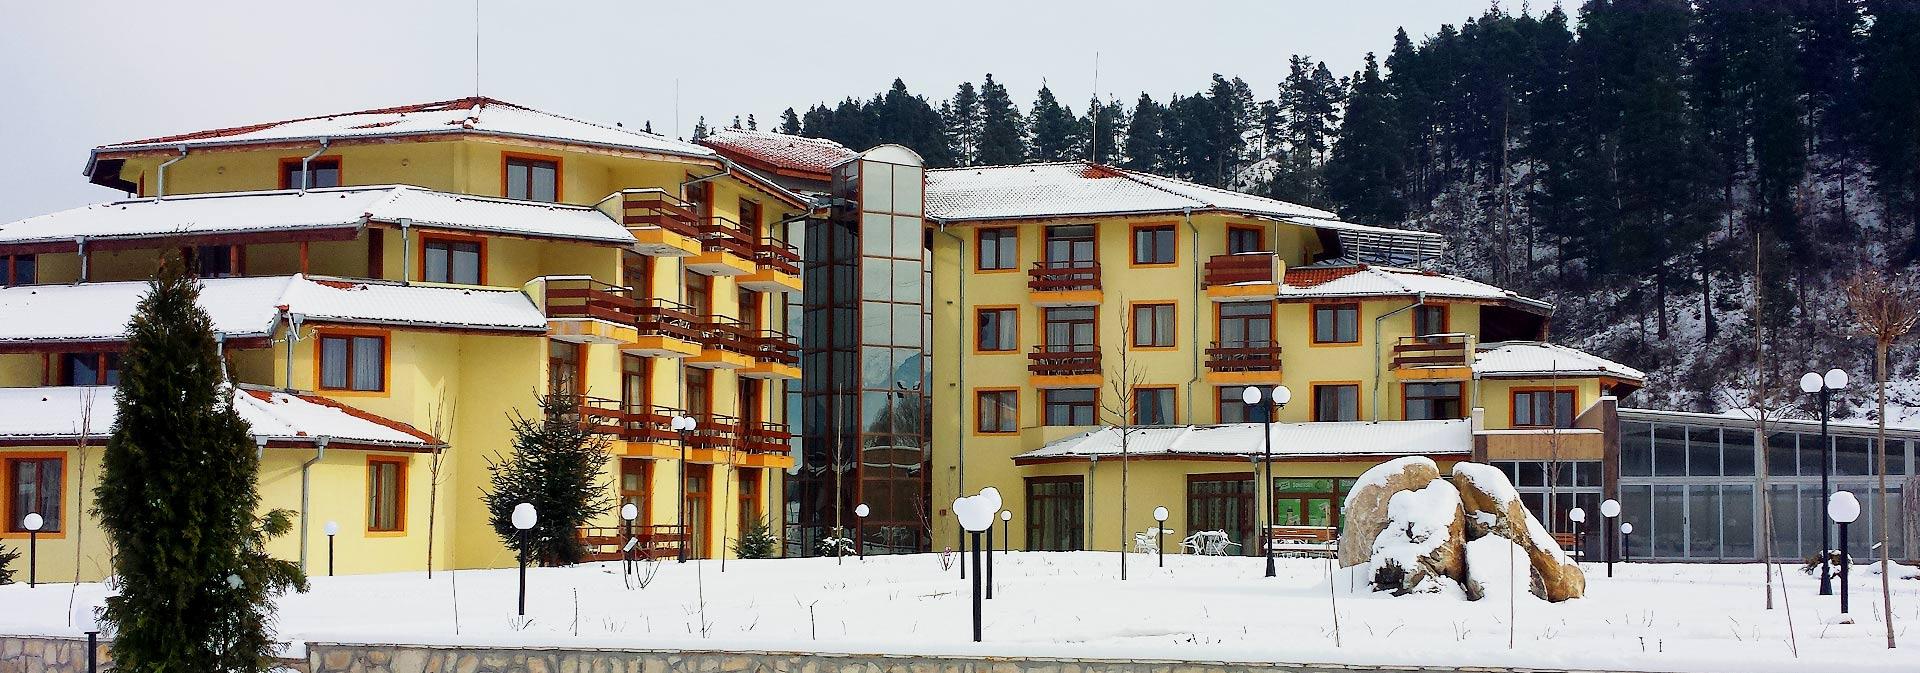 rimska-banya-fasad4